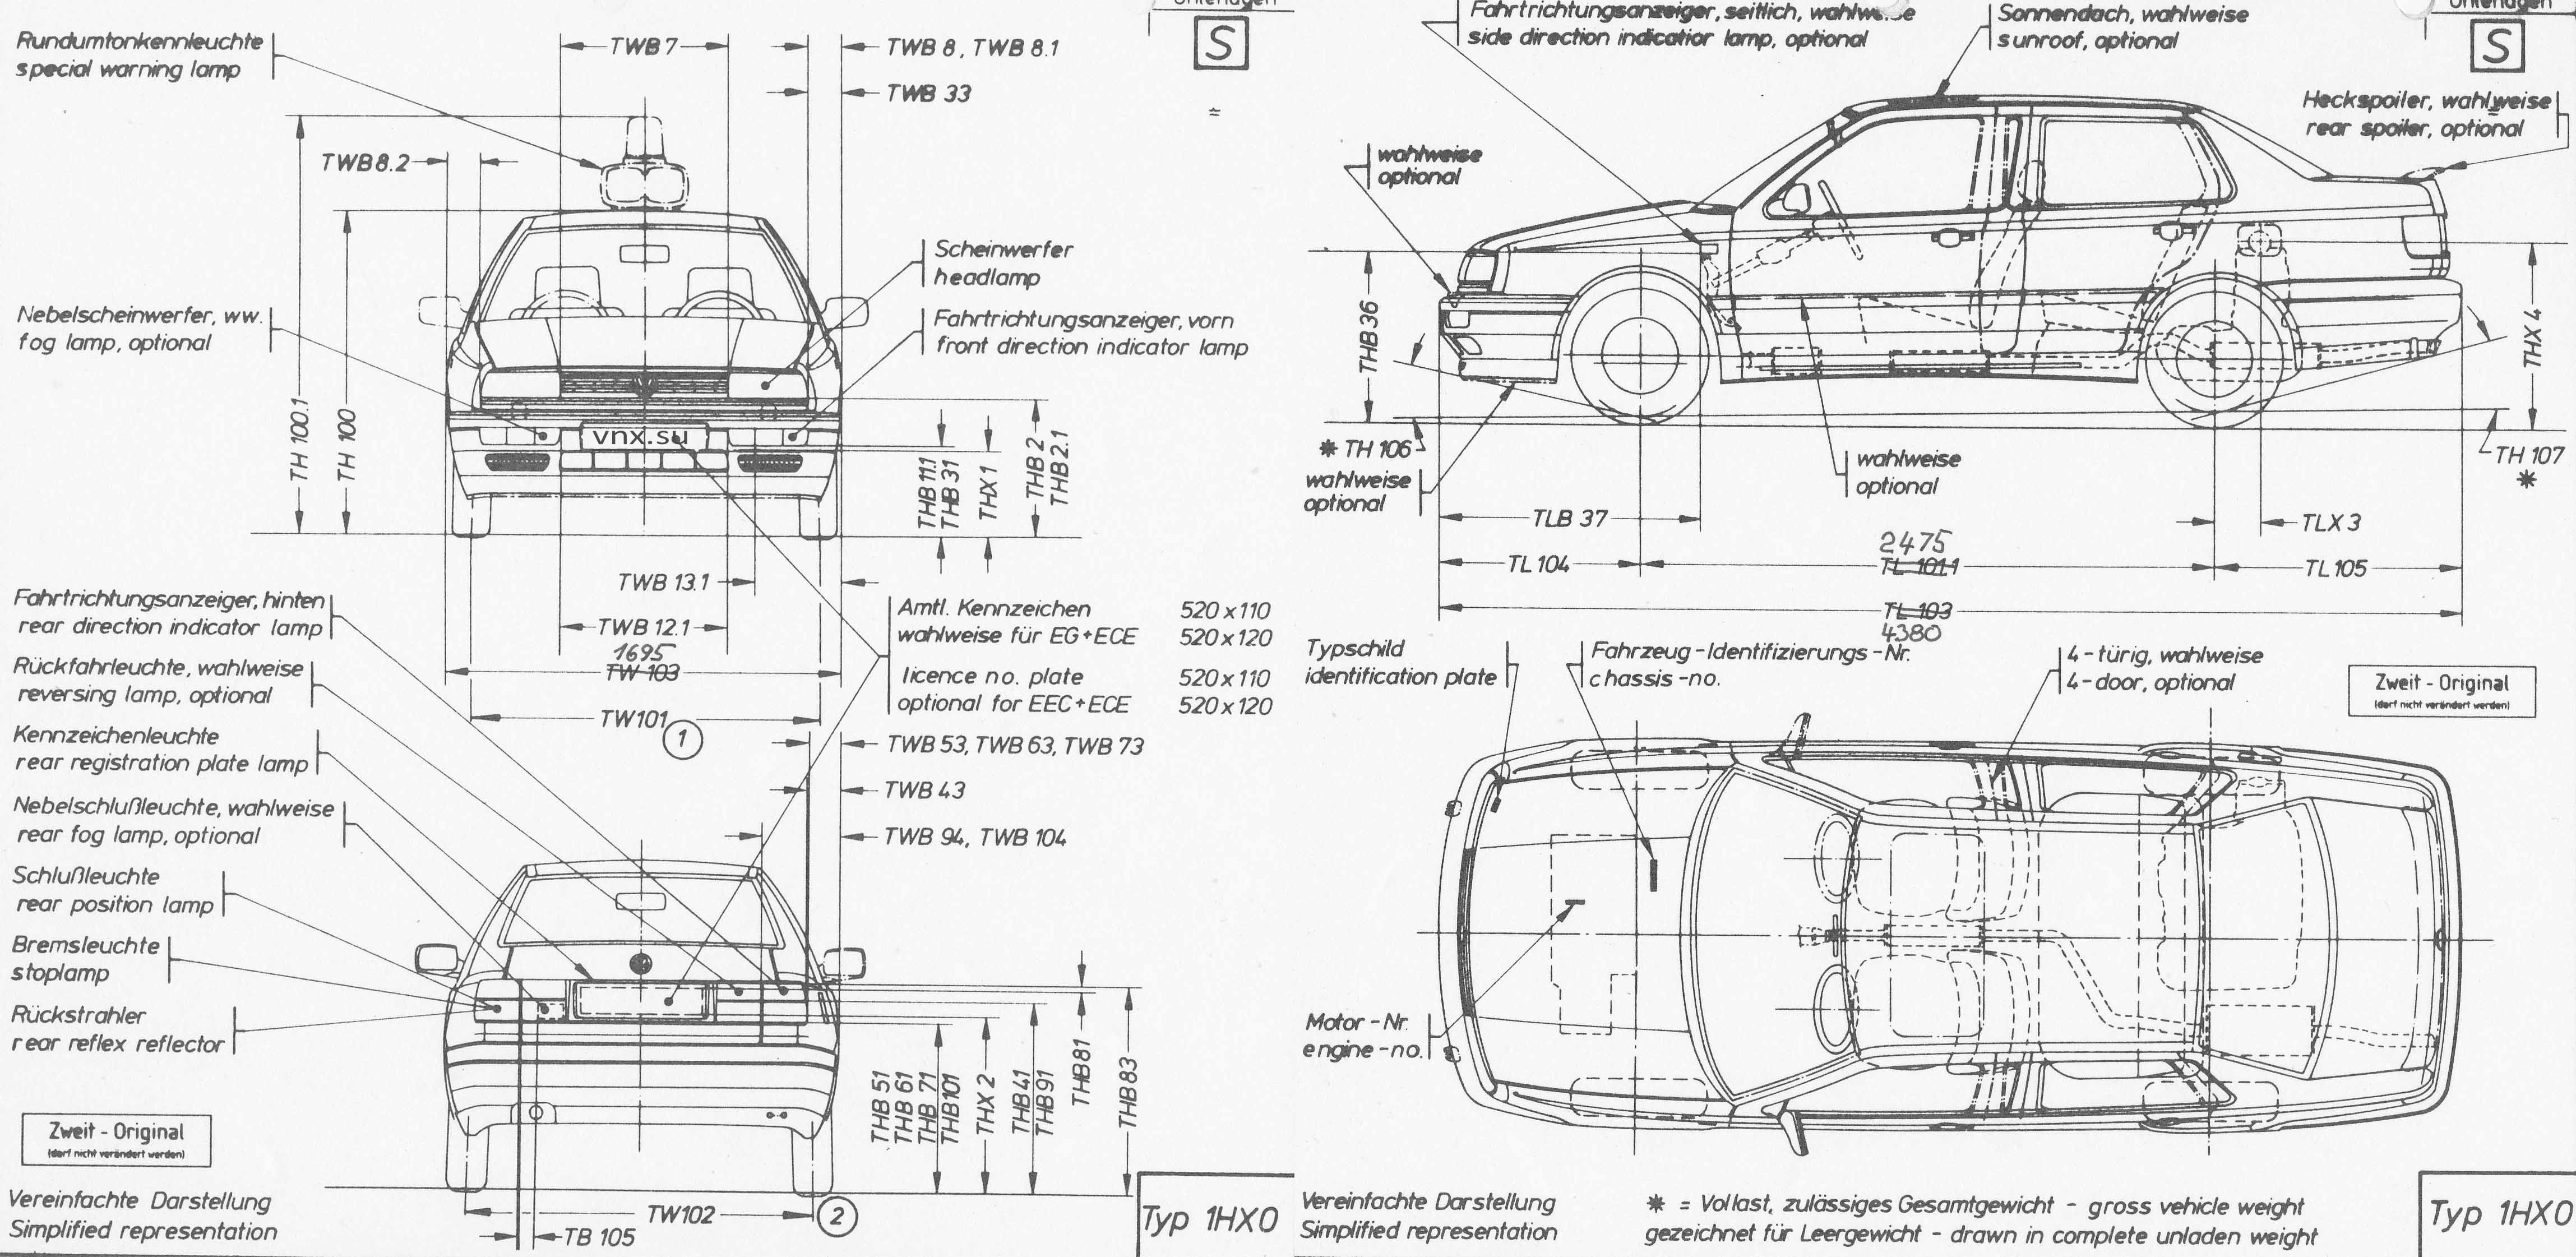 volkswagen b5 инструкция по эксплуатации